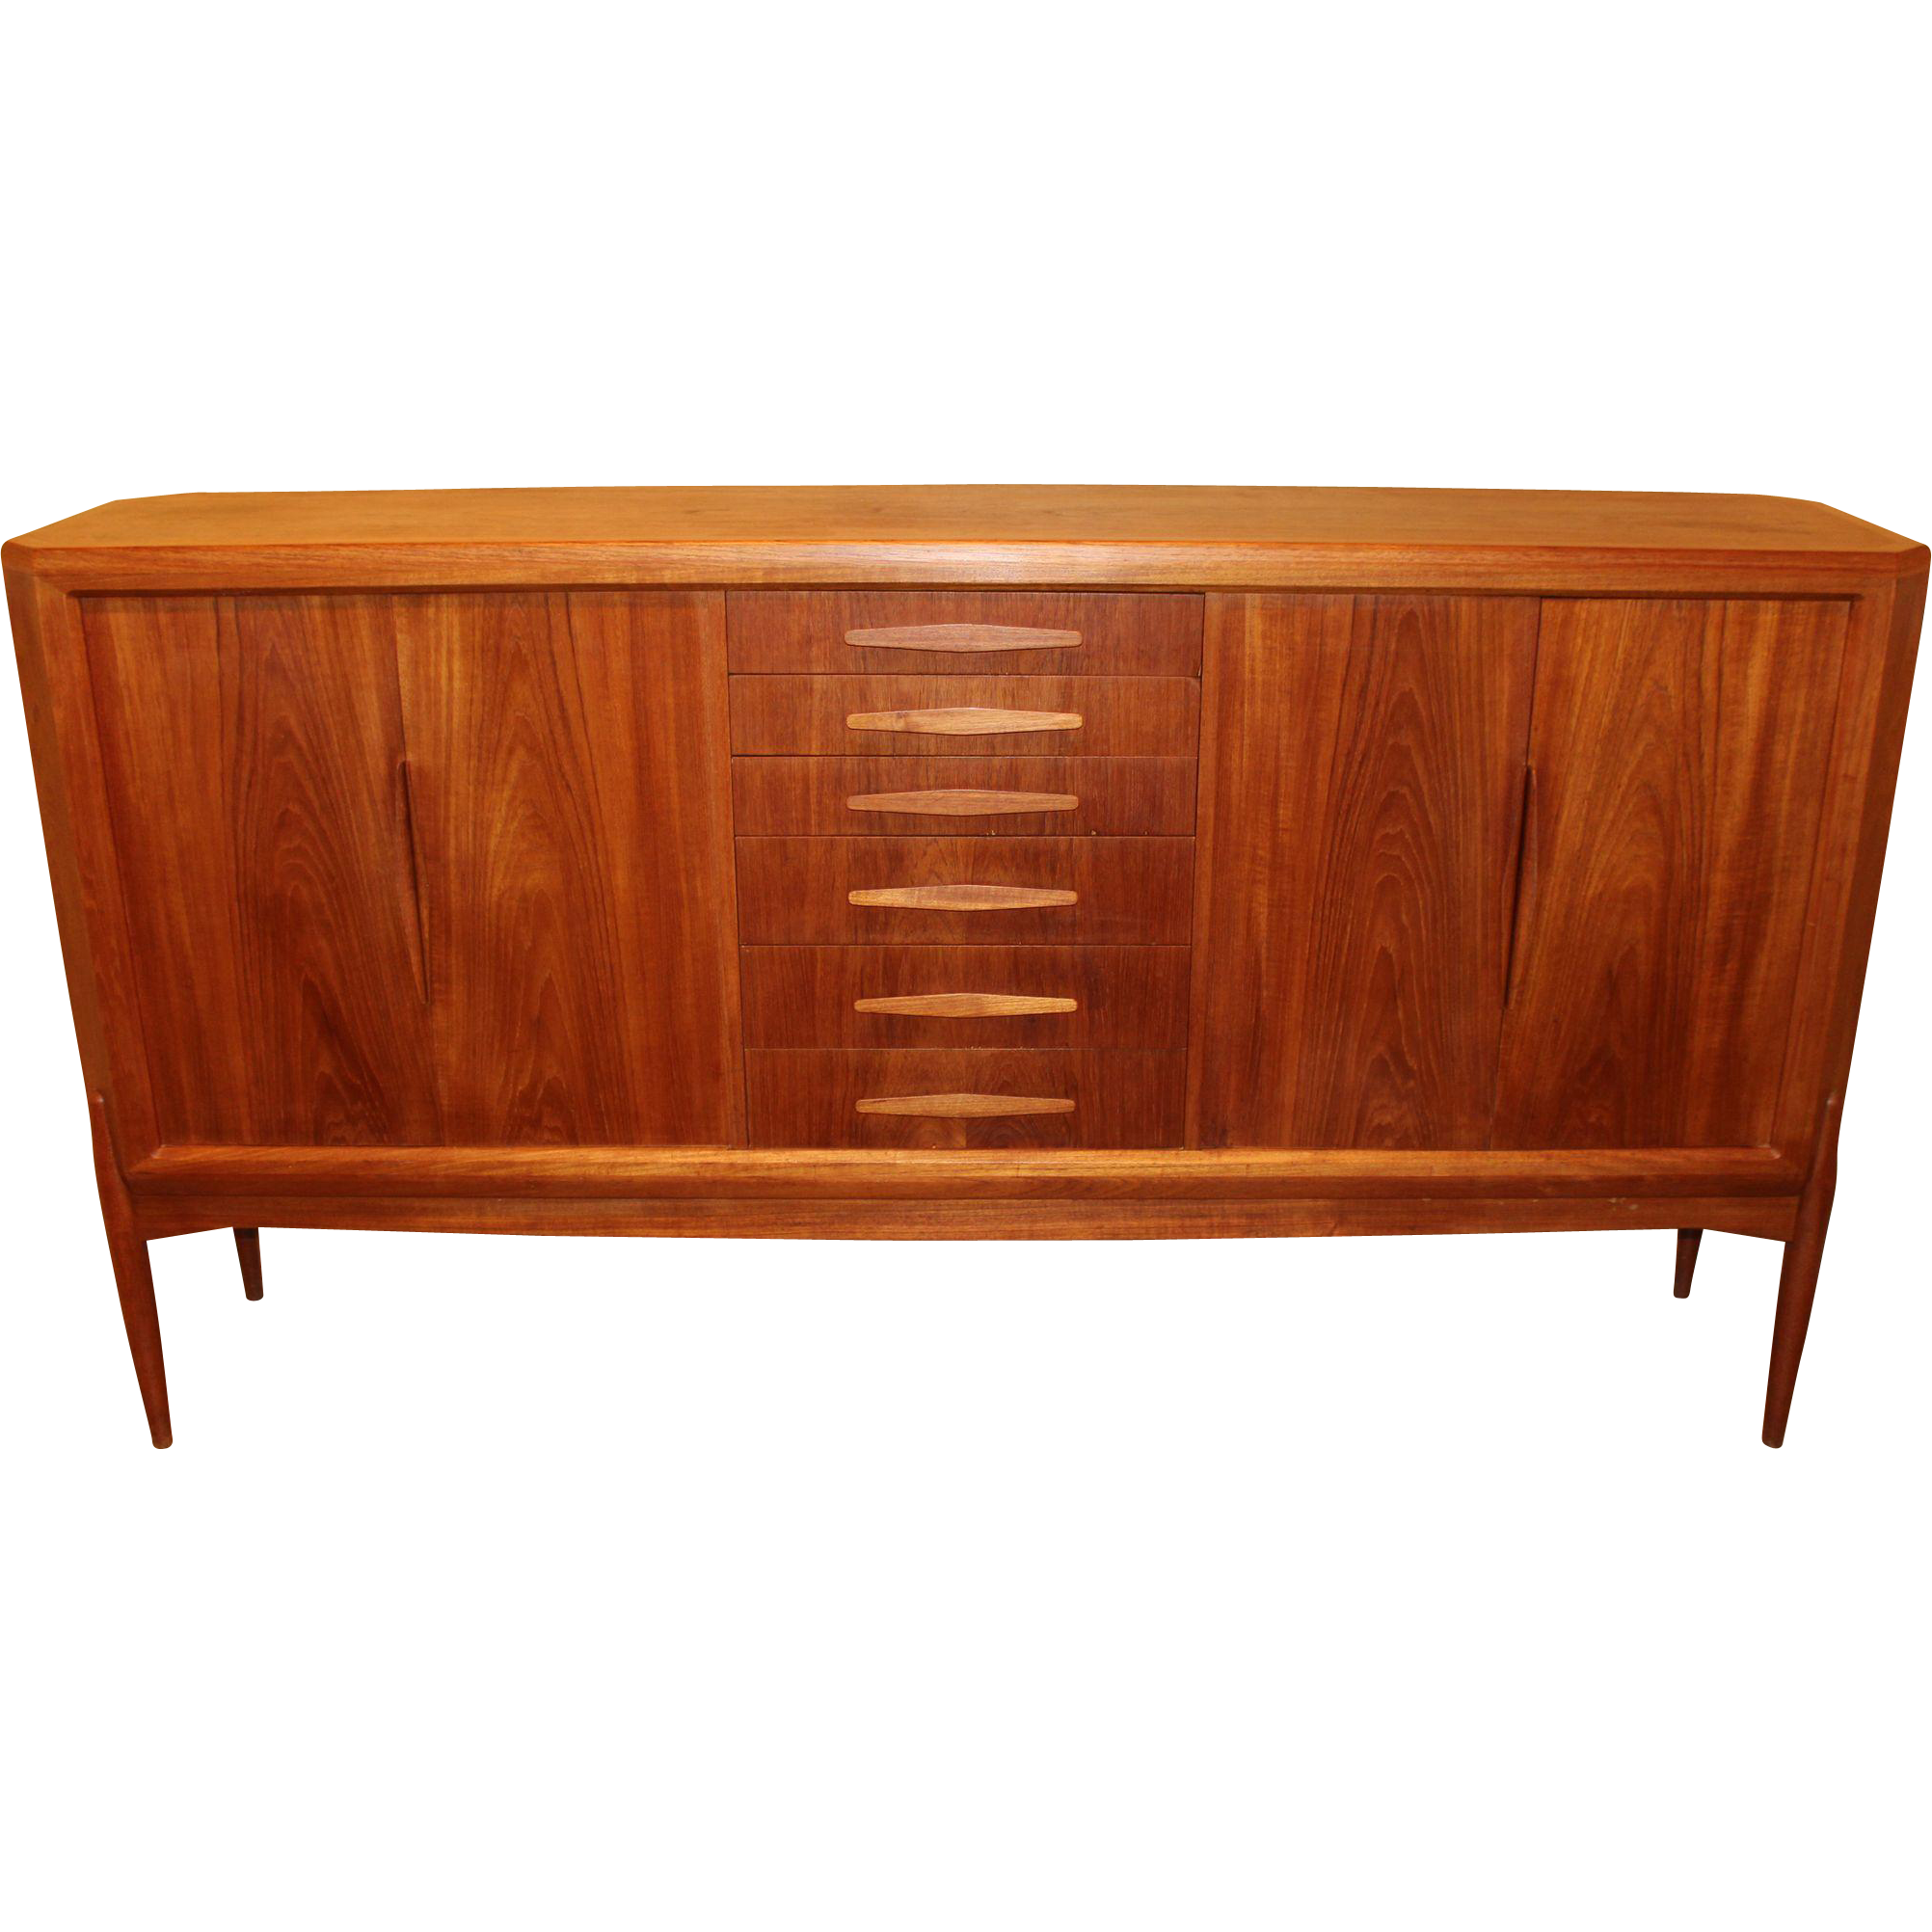 Danish Sideboard or Highboy Designed by Johannes Andersen, circa 1950s